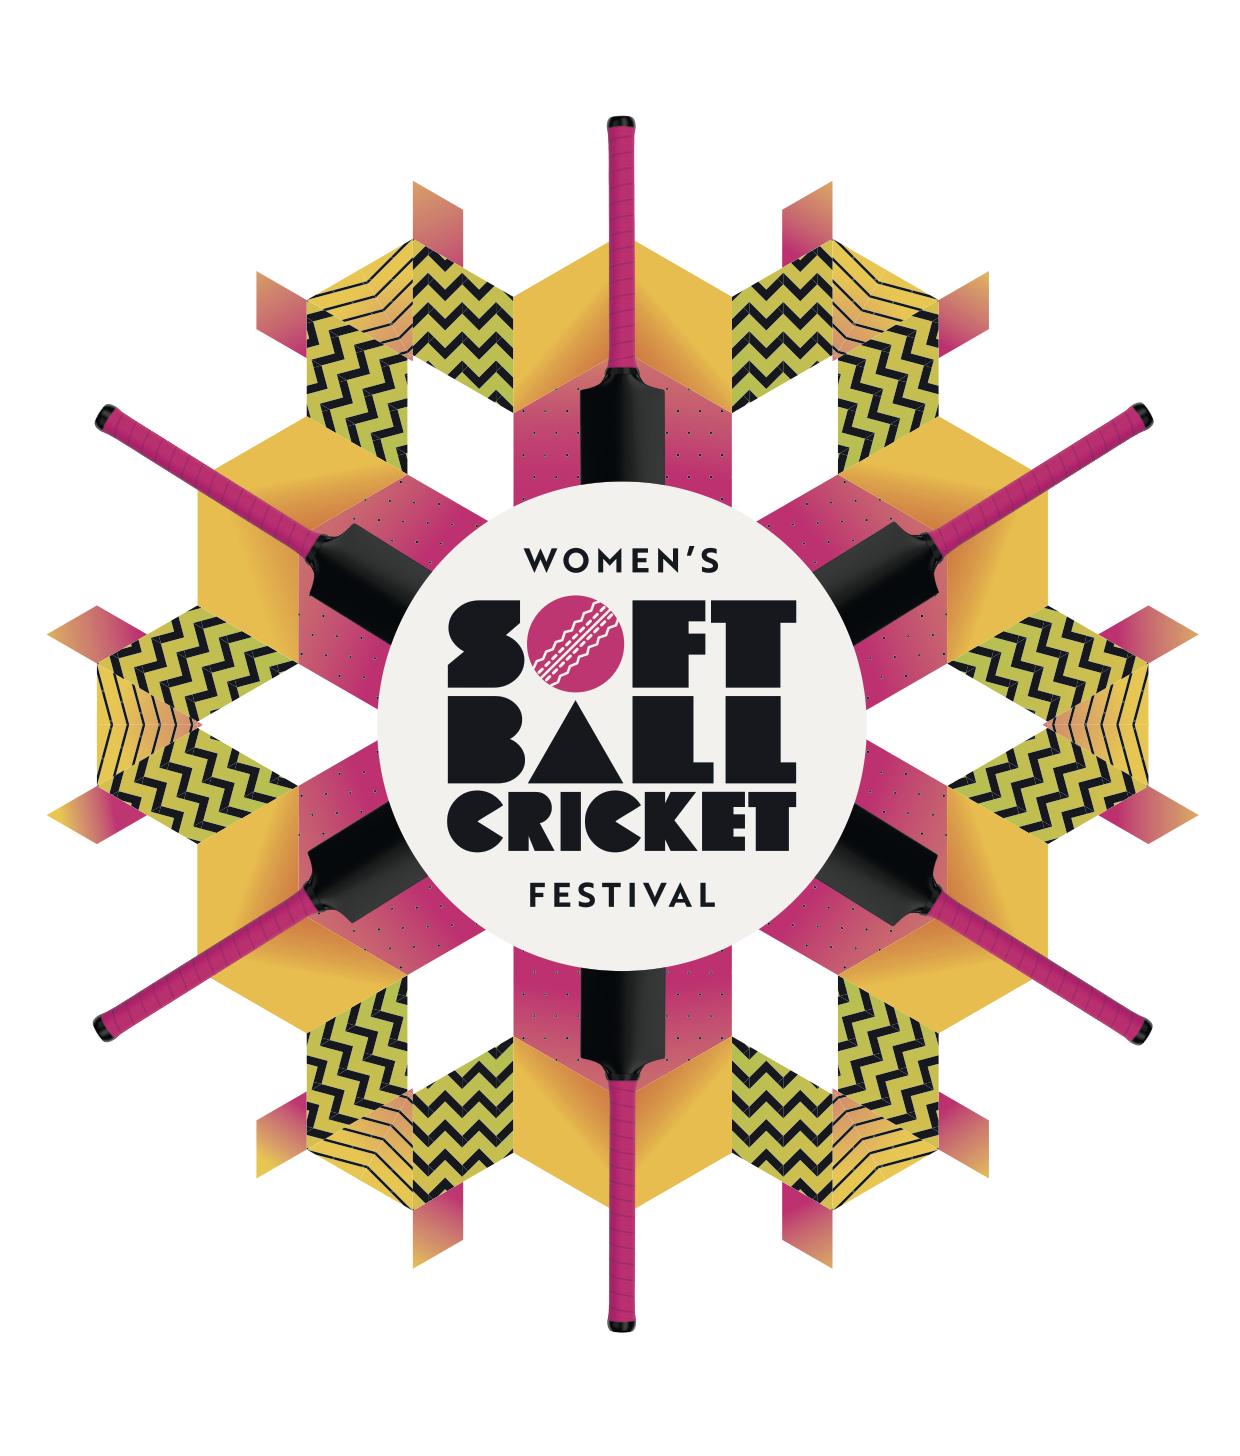 Women_s_Softball_Cricket